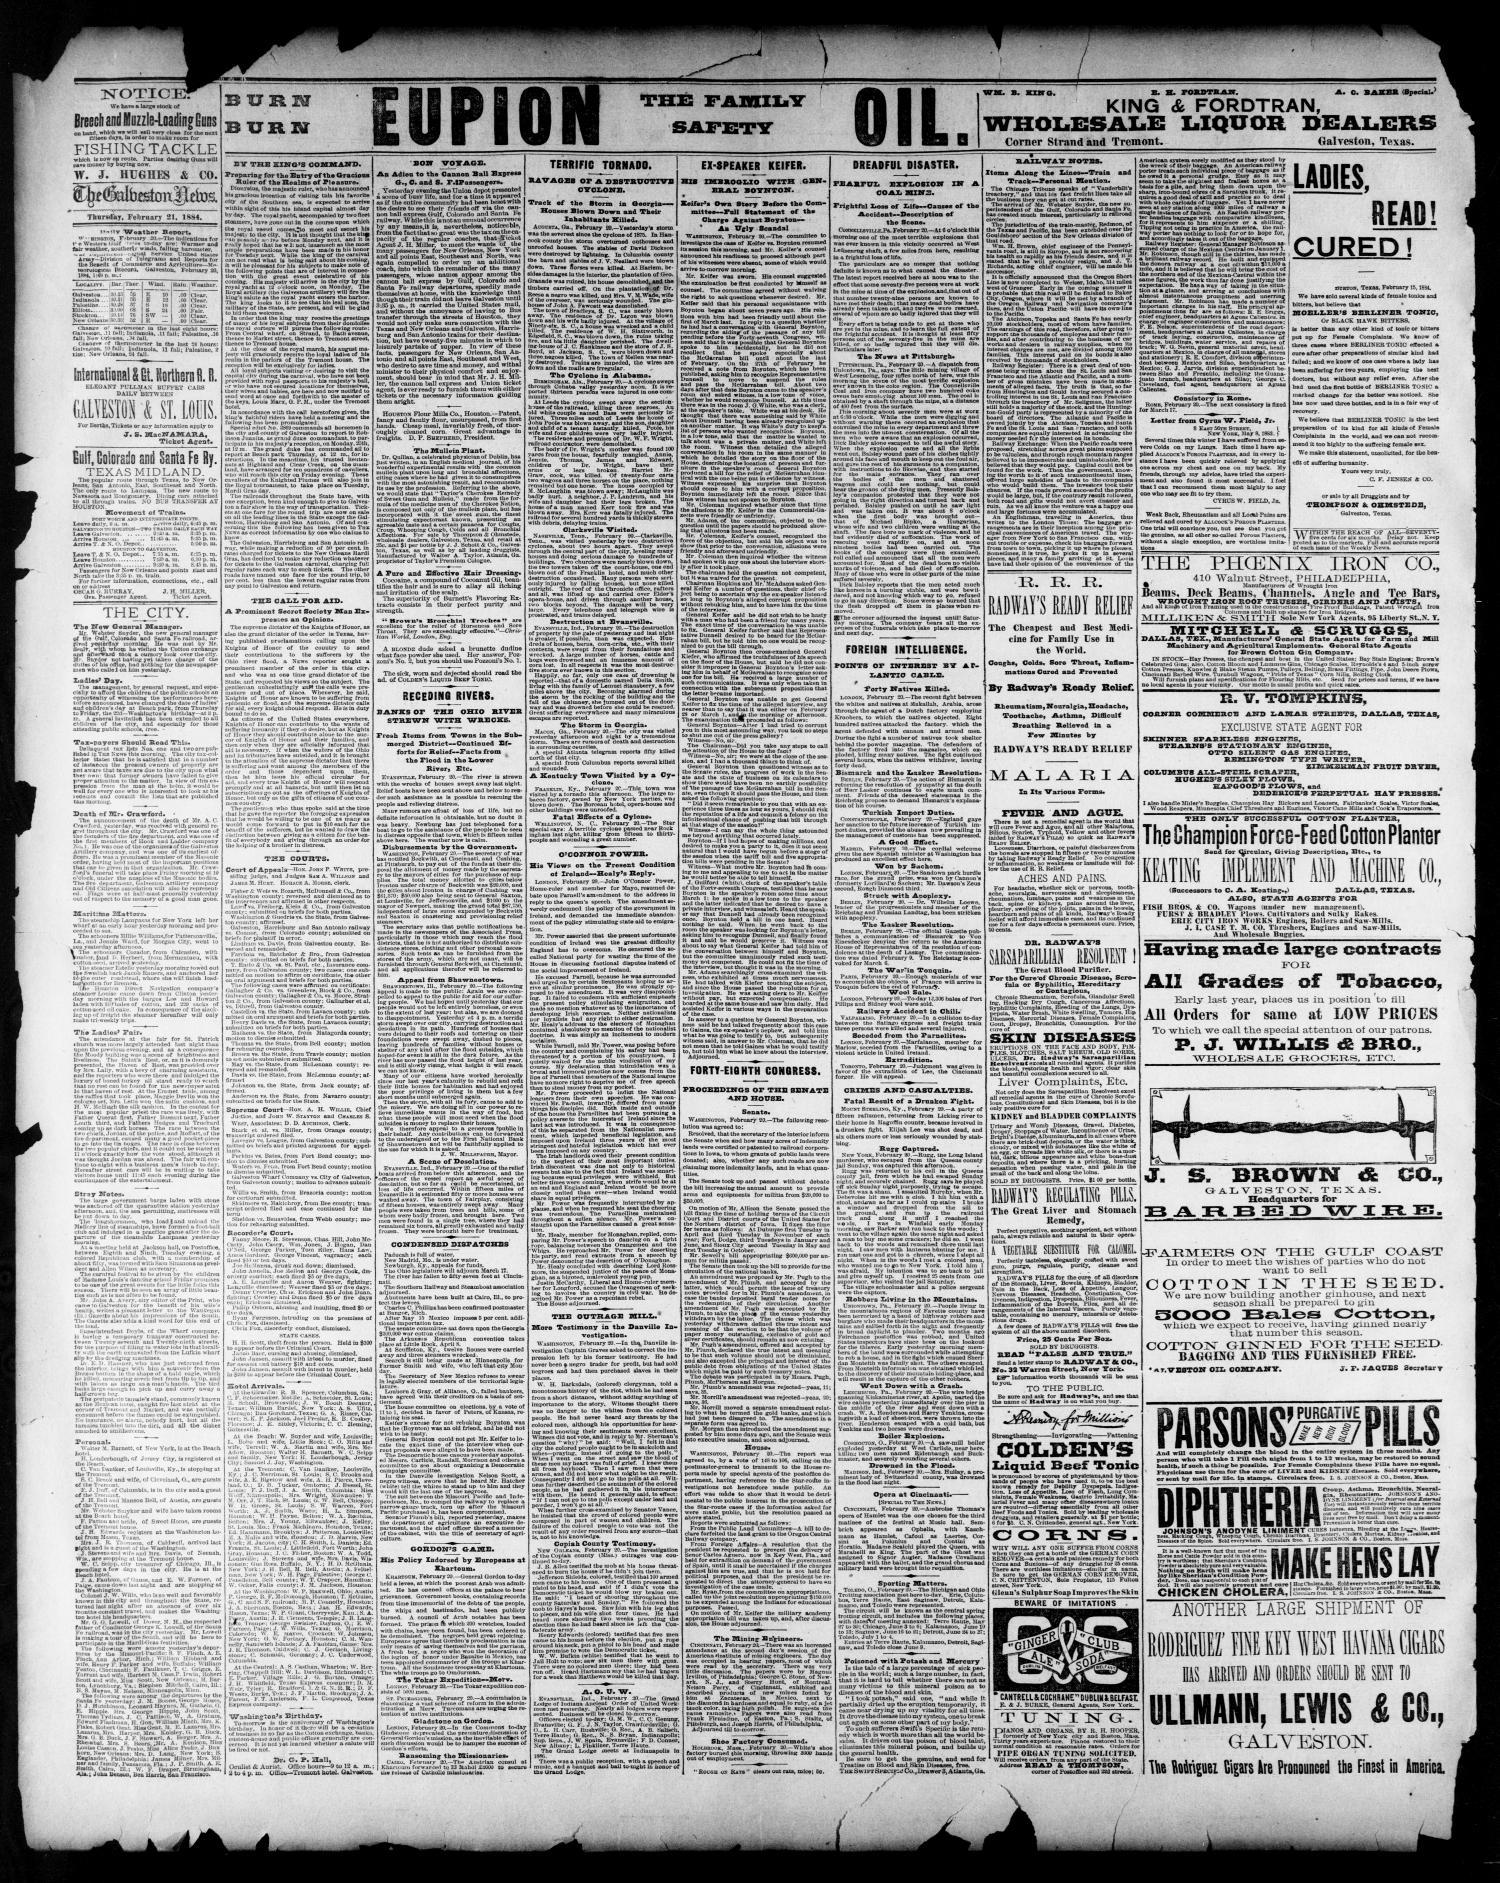 The Galveston Daily News  (Galveston, Tex ), Vol  42, No